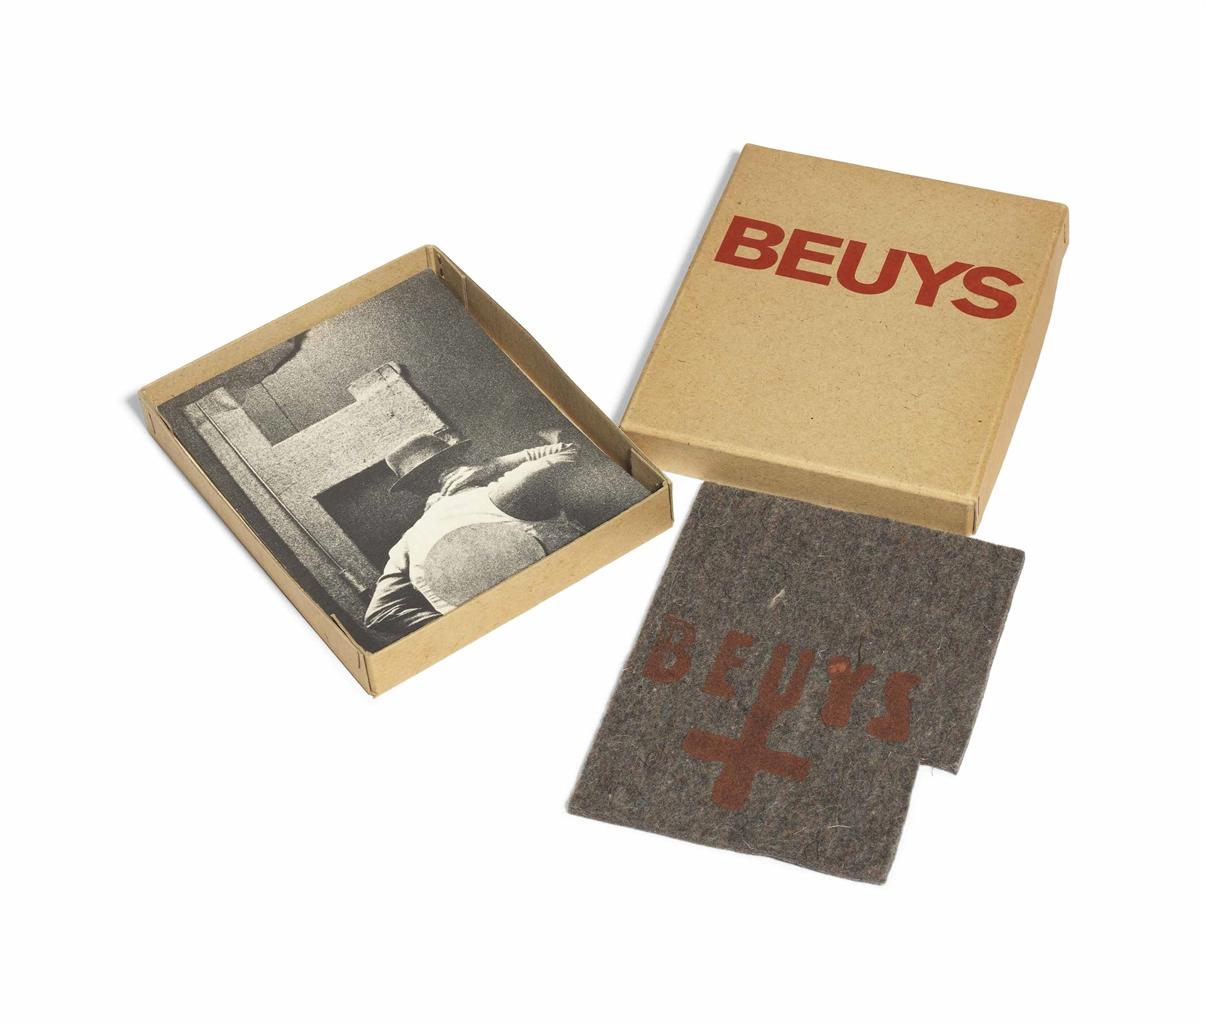 Joseph Beuys-Mönchengladbach Museum Catalogue-1967